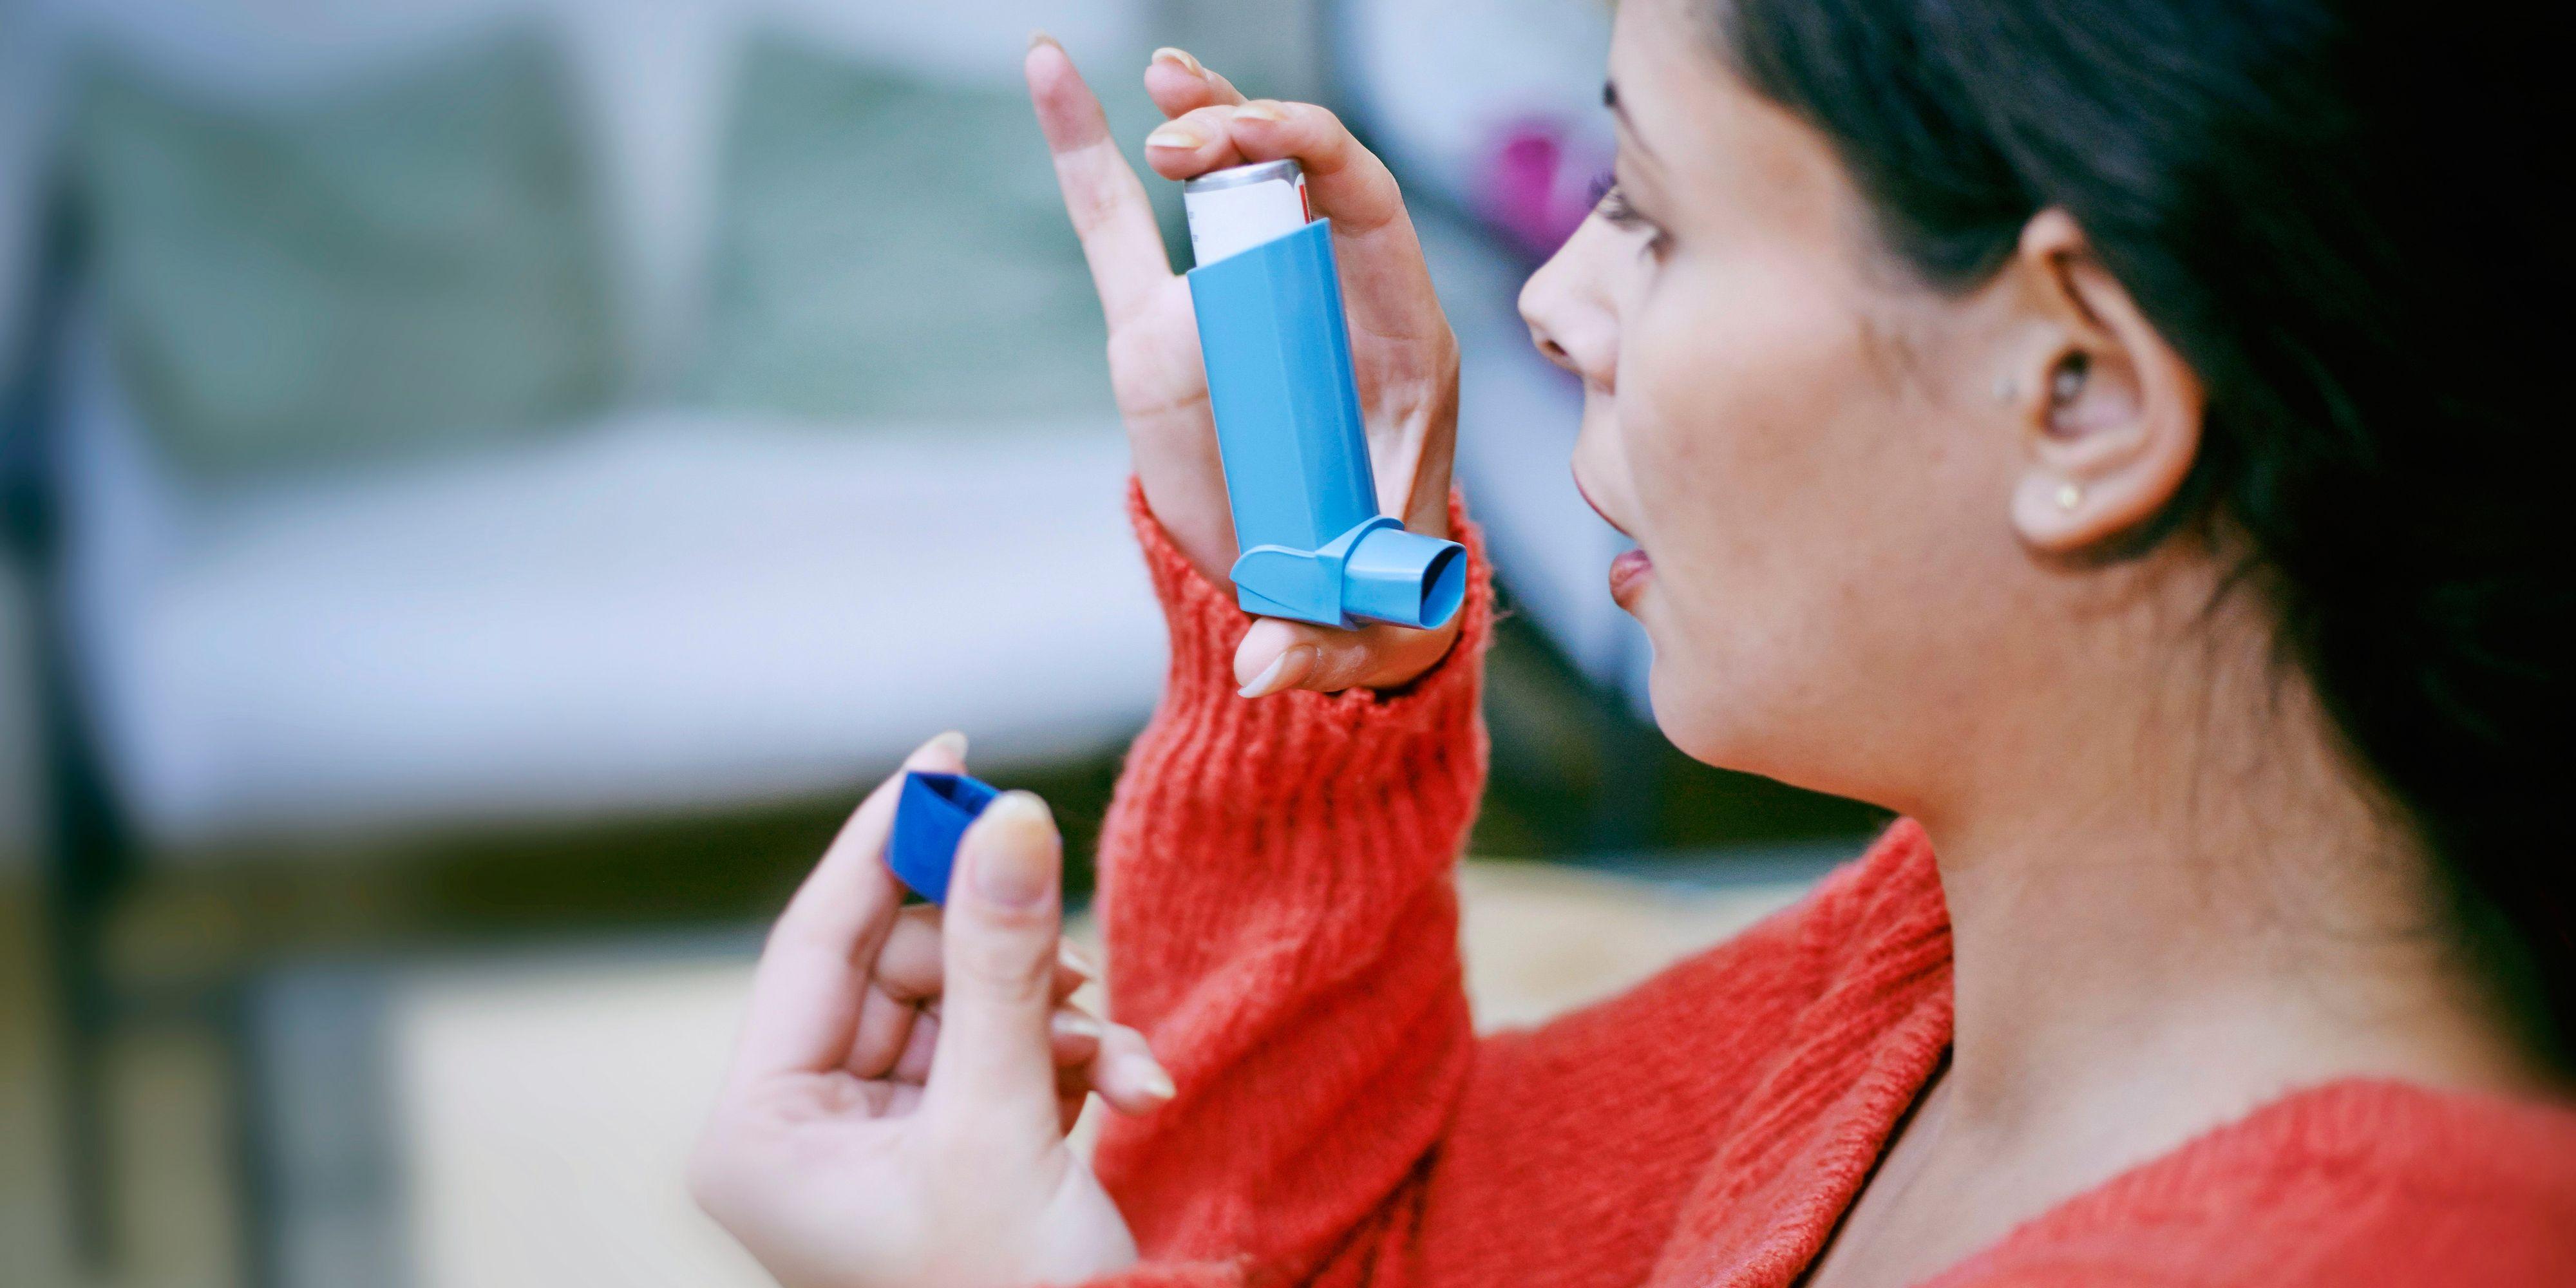 Salbutamol: Ventolin for asthma and breathlessness